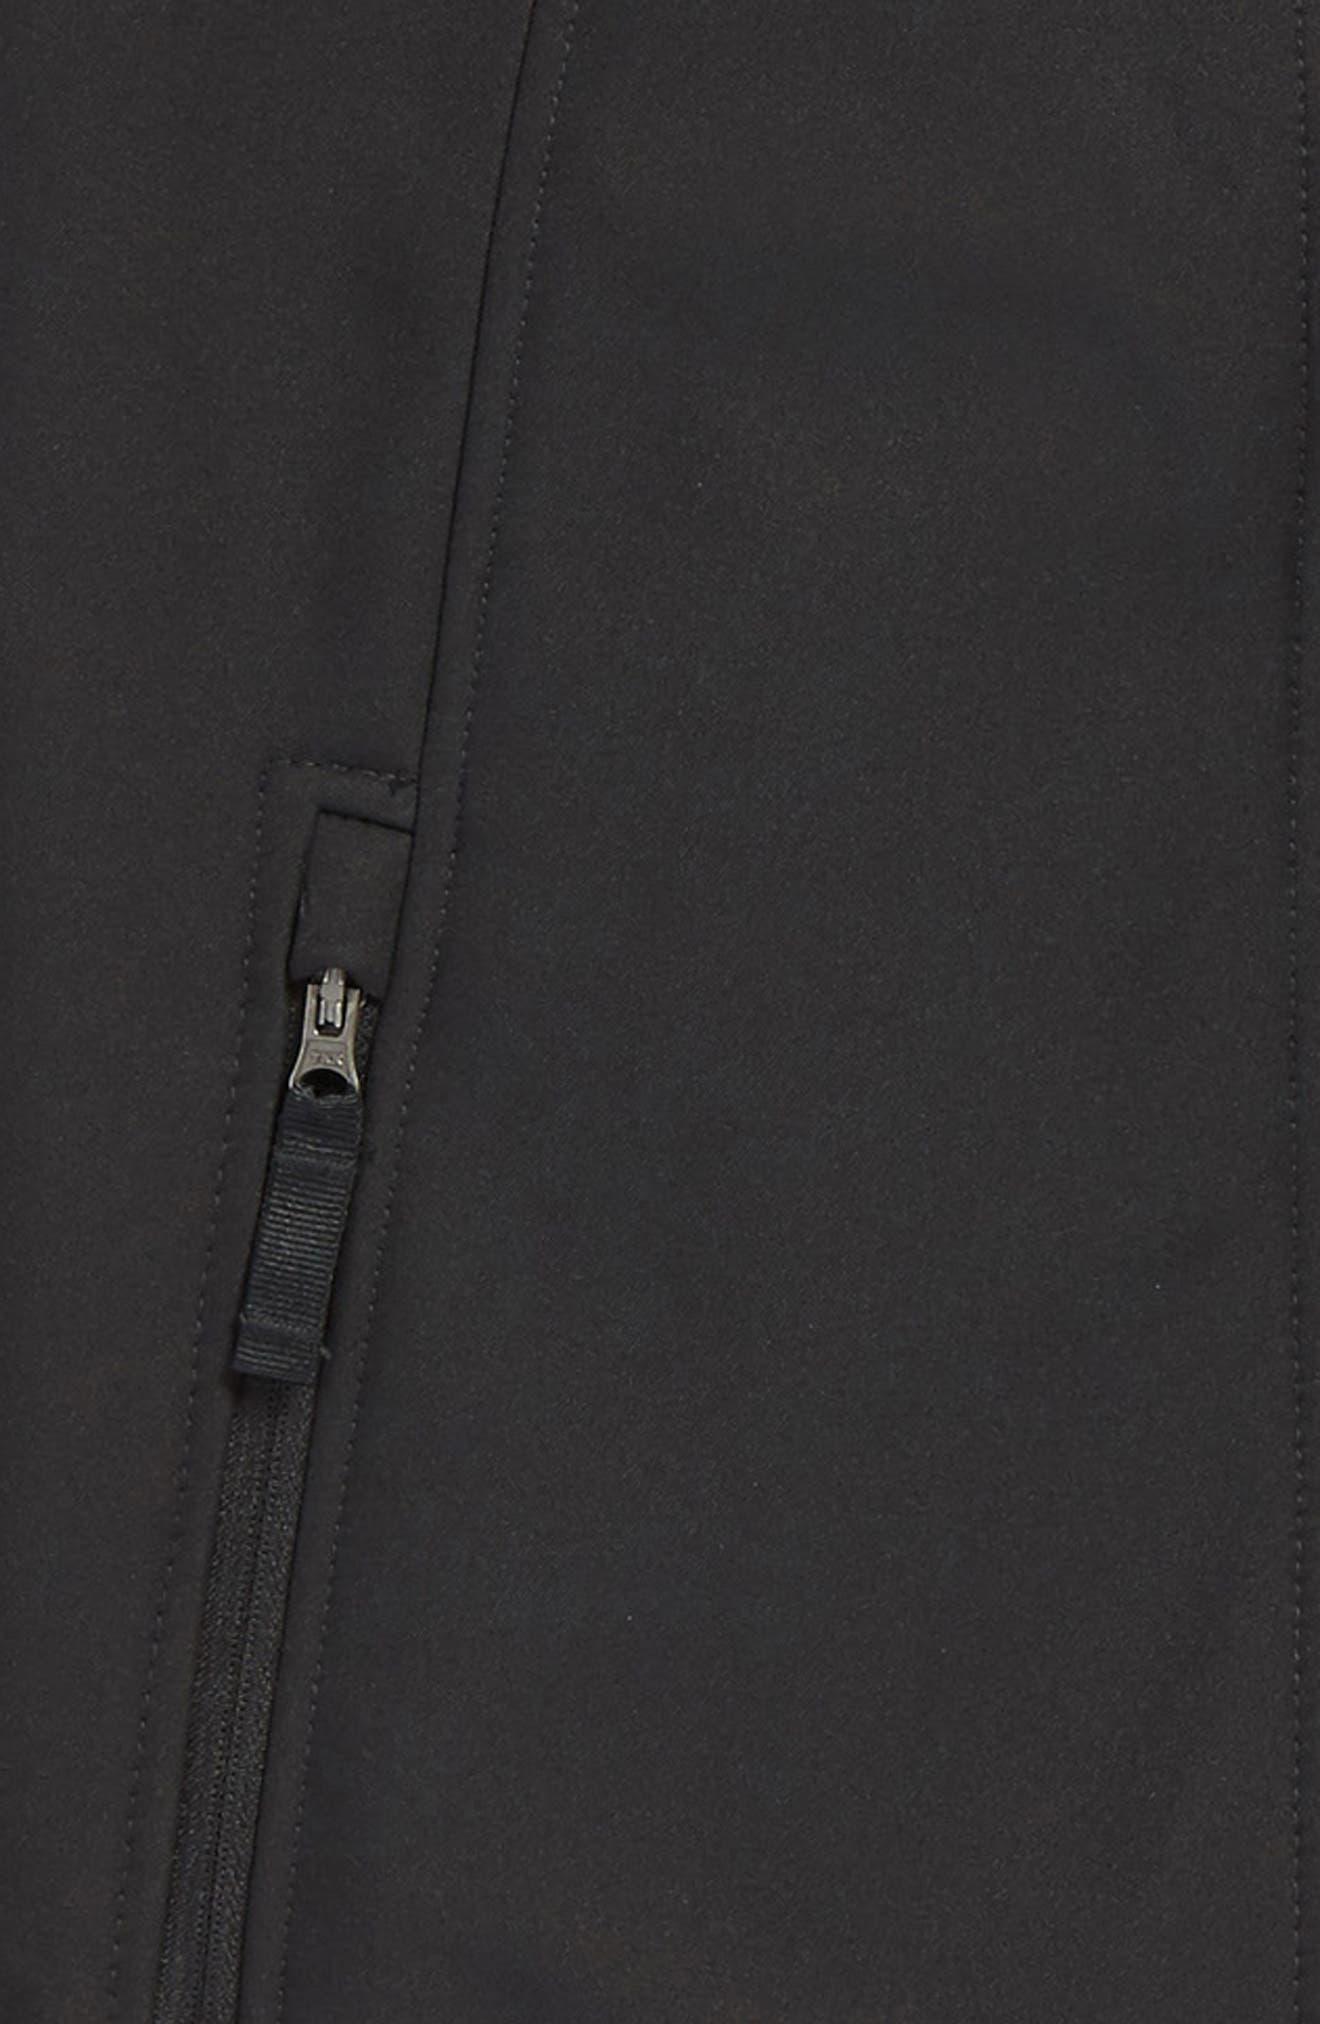 Apex Bionic Water Repellent Jacket,                             Alternate thumbnail 2, color,                             Tnf Black